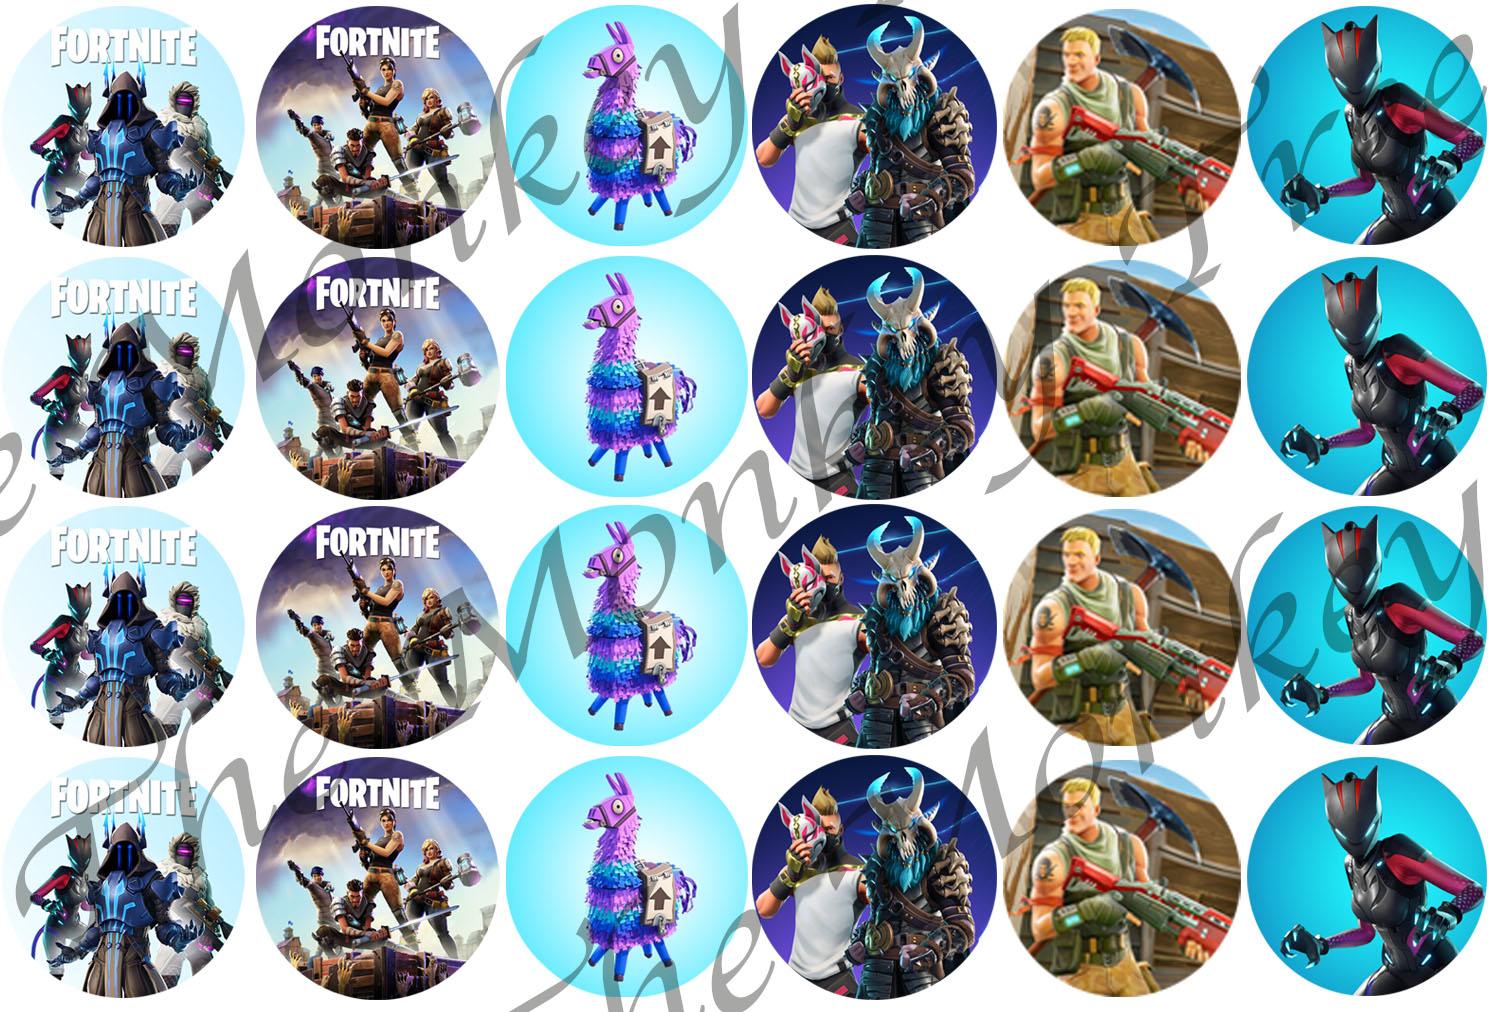 Fortnite Edible Cupcake Toppers x 24 set 2 | The Monkey Tree